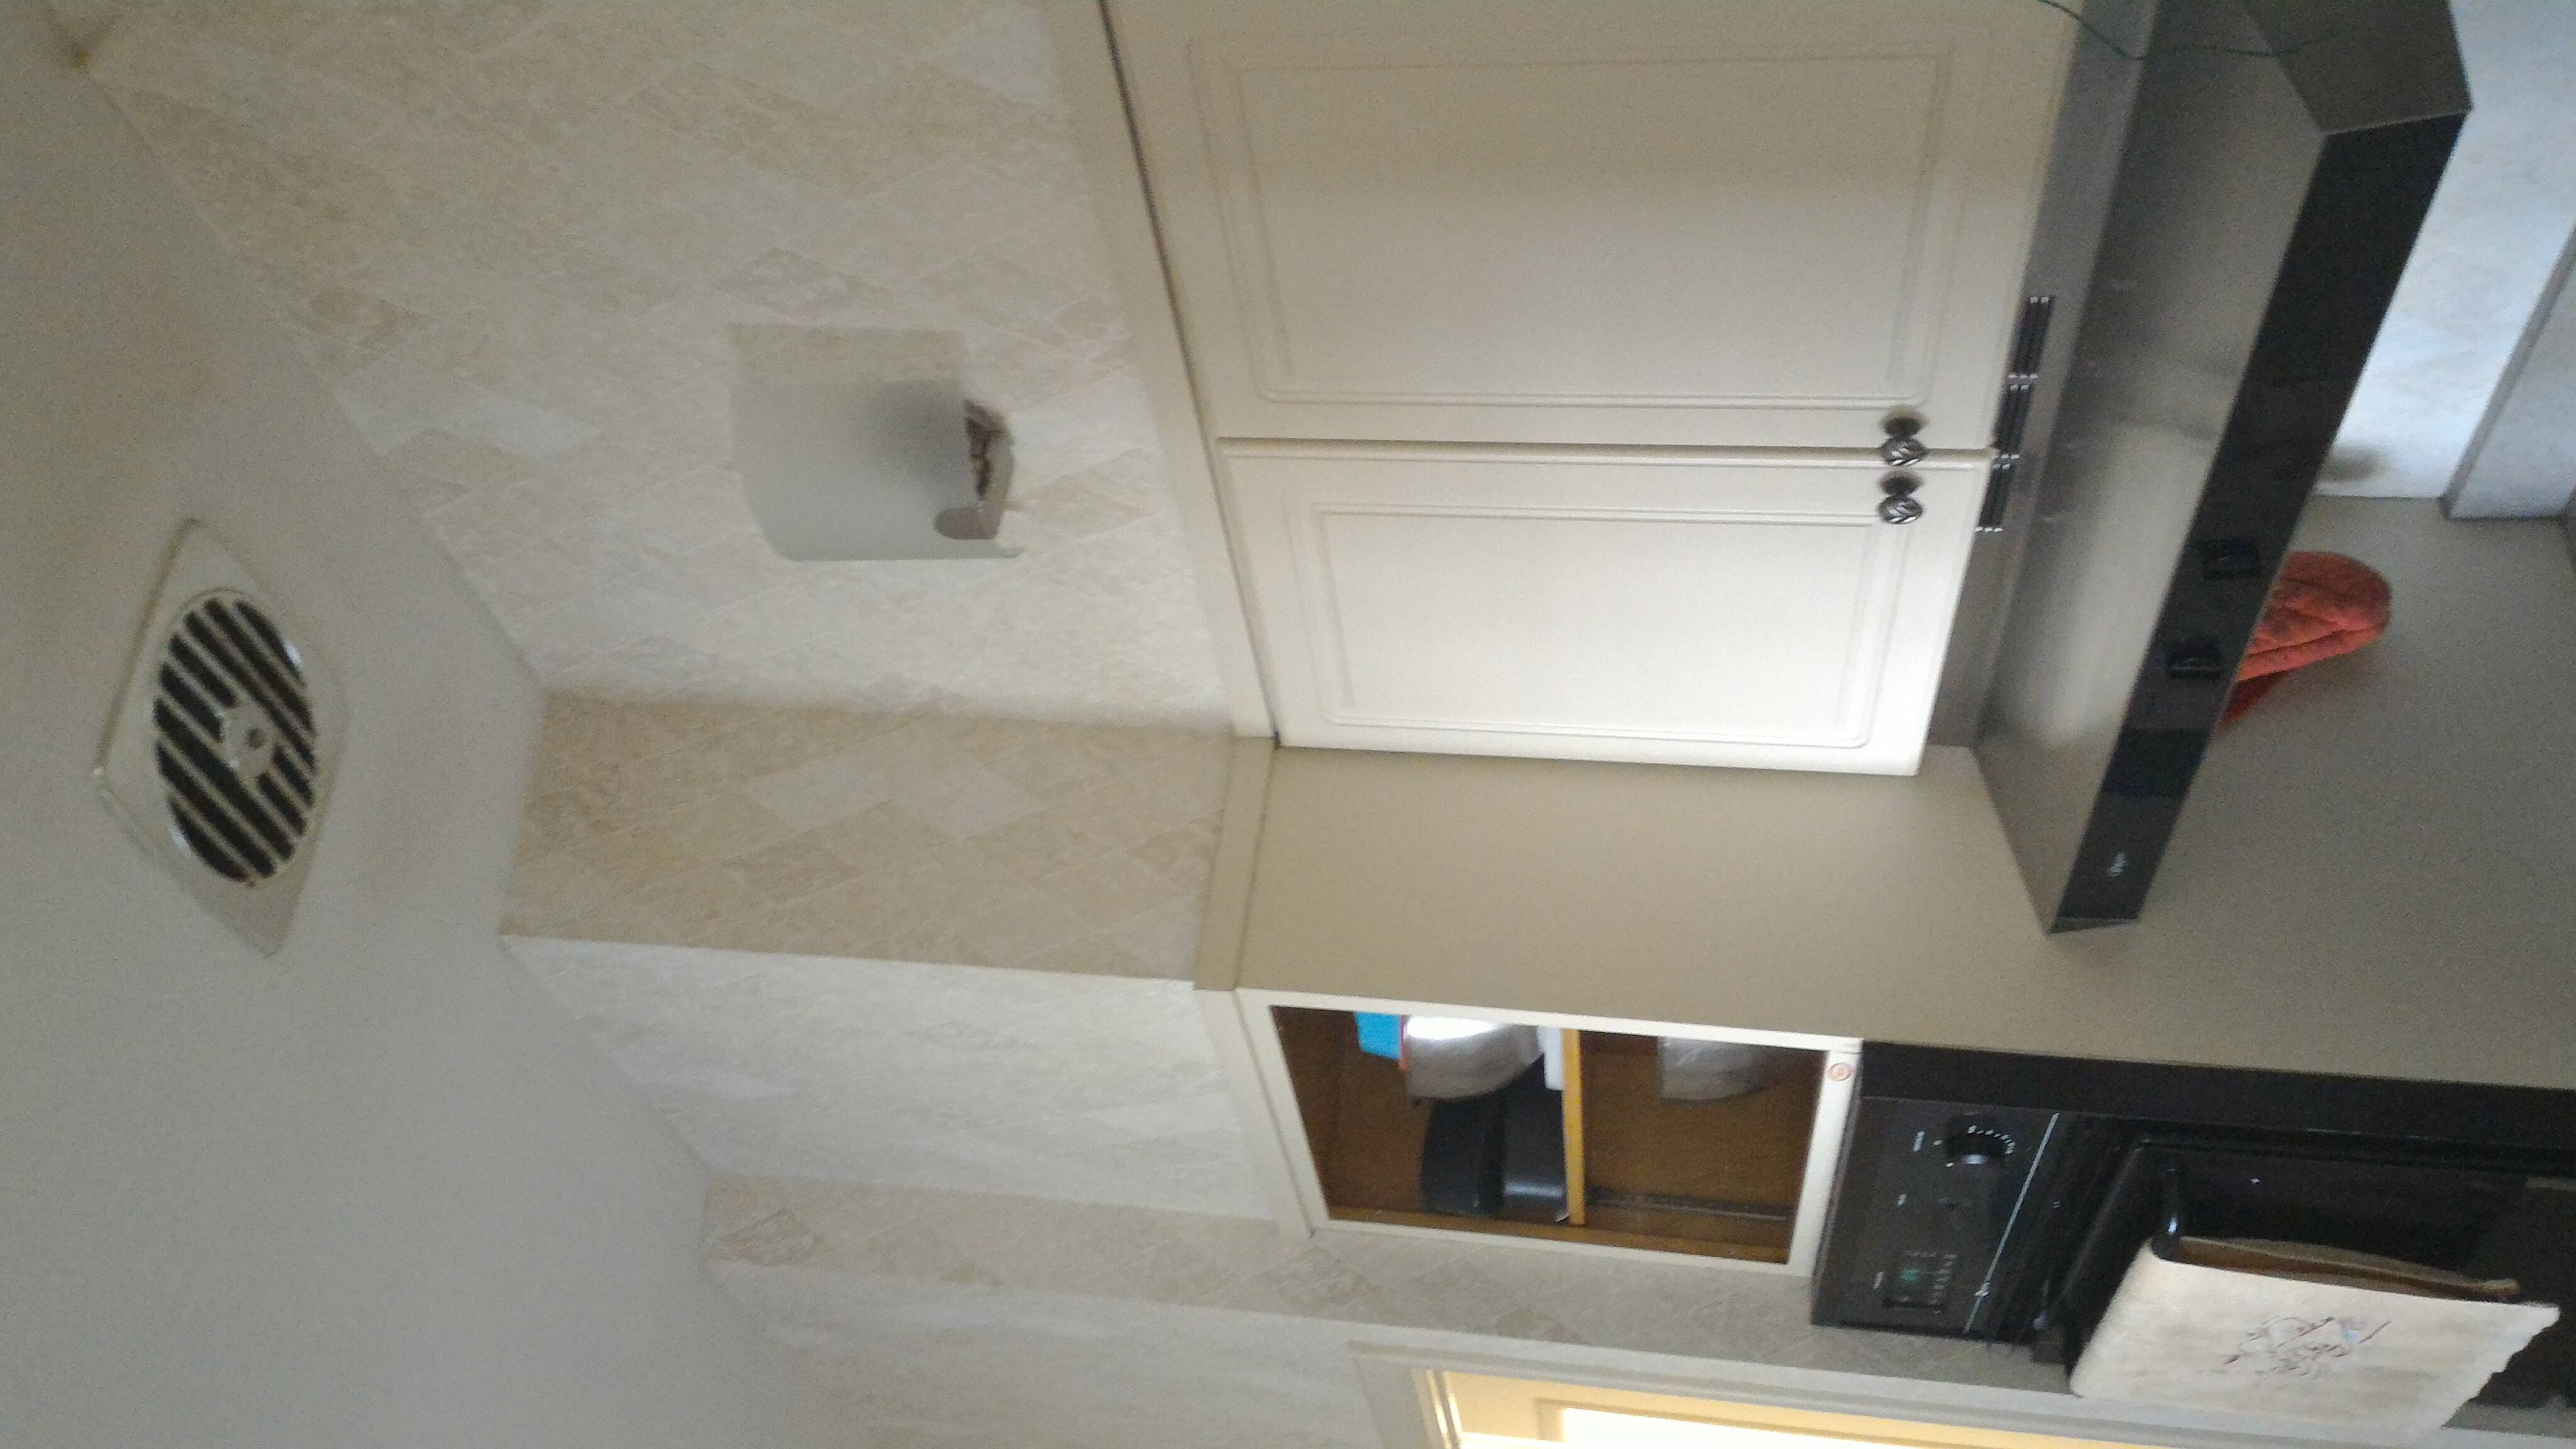 ceiling exhaust fan in kitchen home